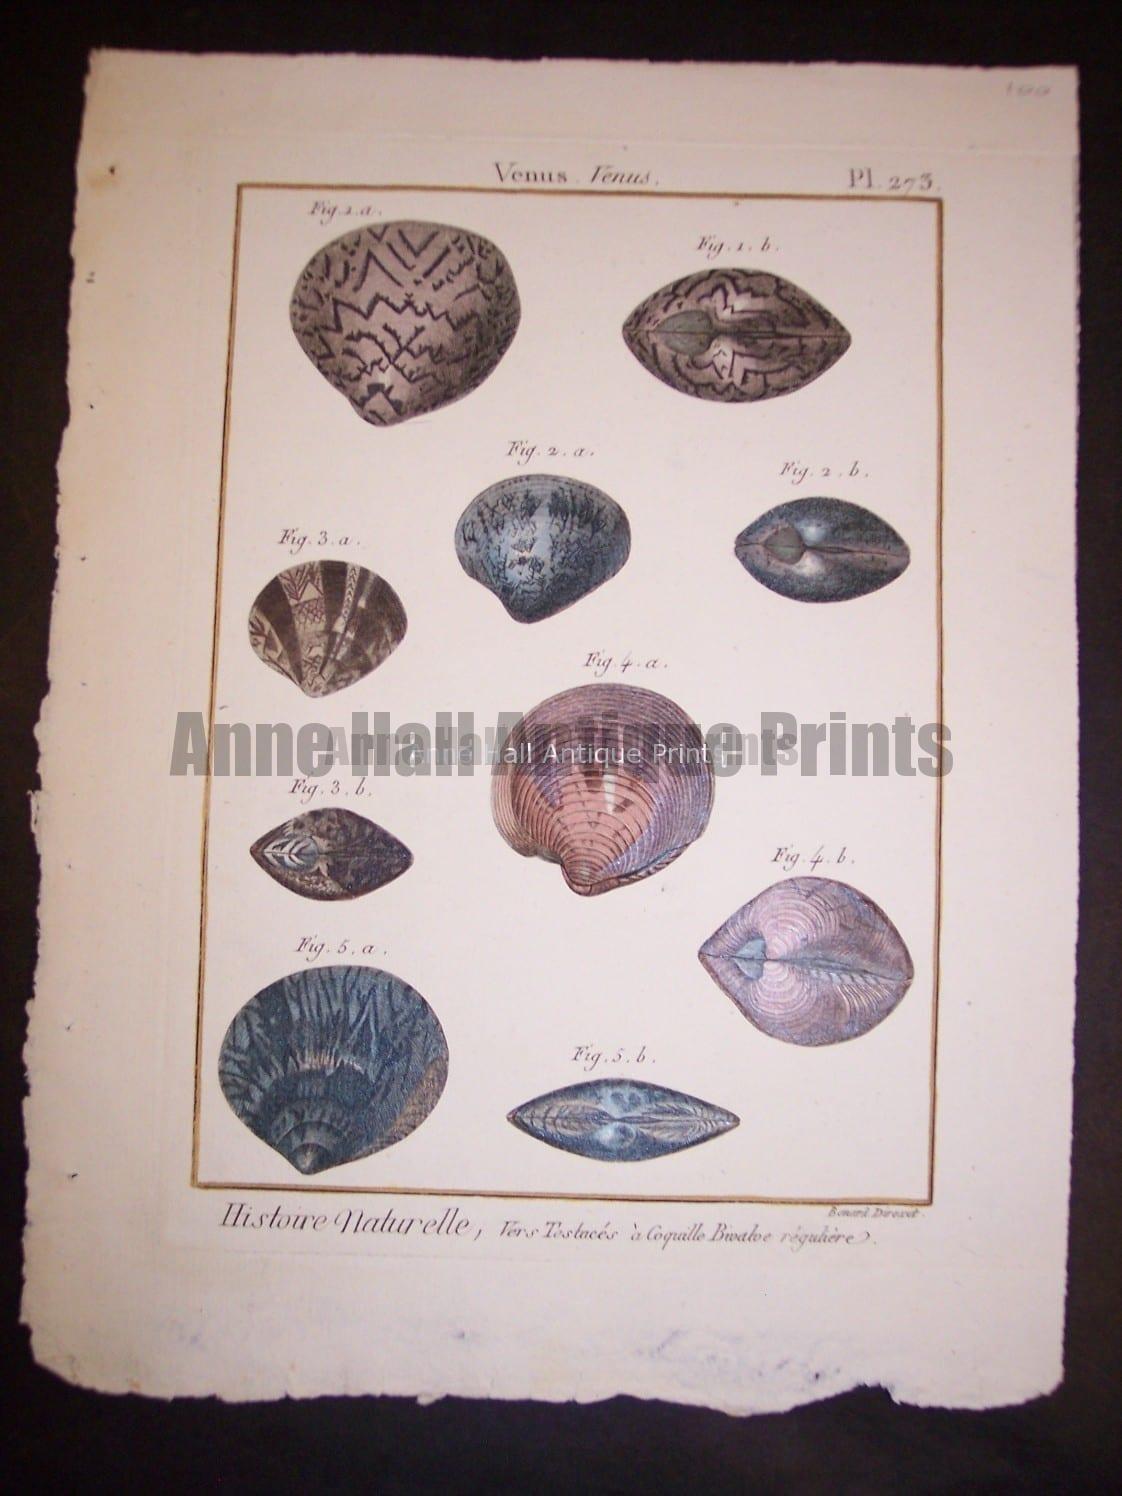 LaMarck Sea Shell Engraving 423